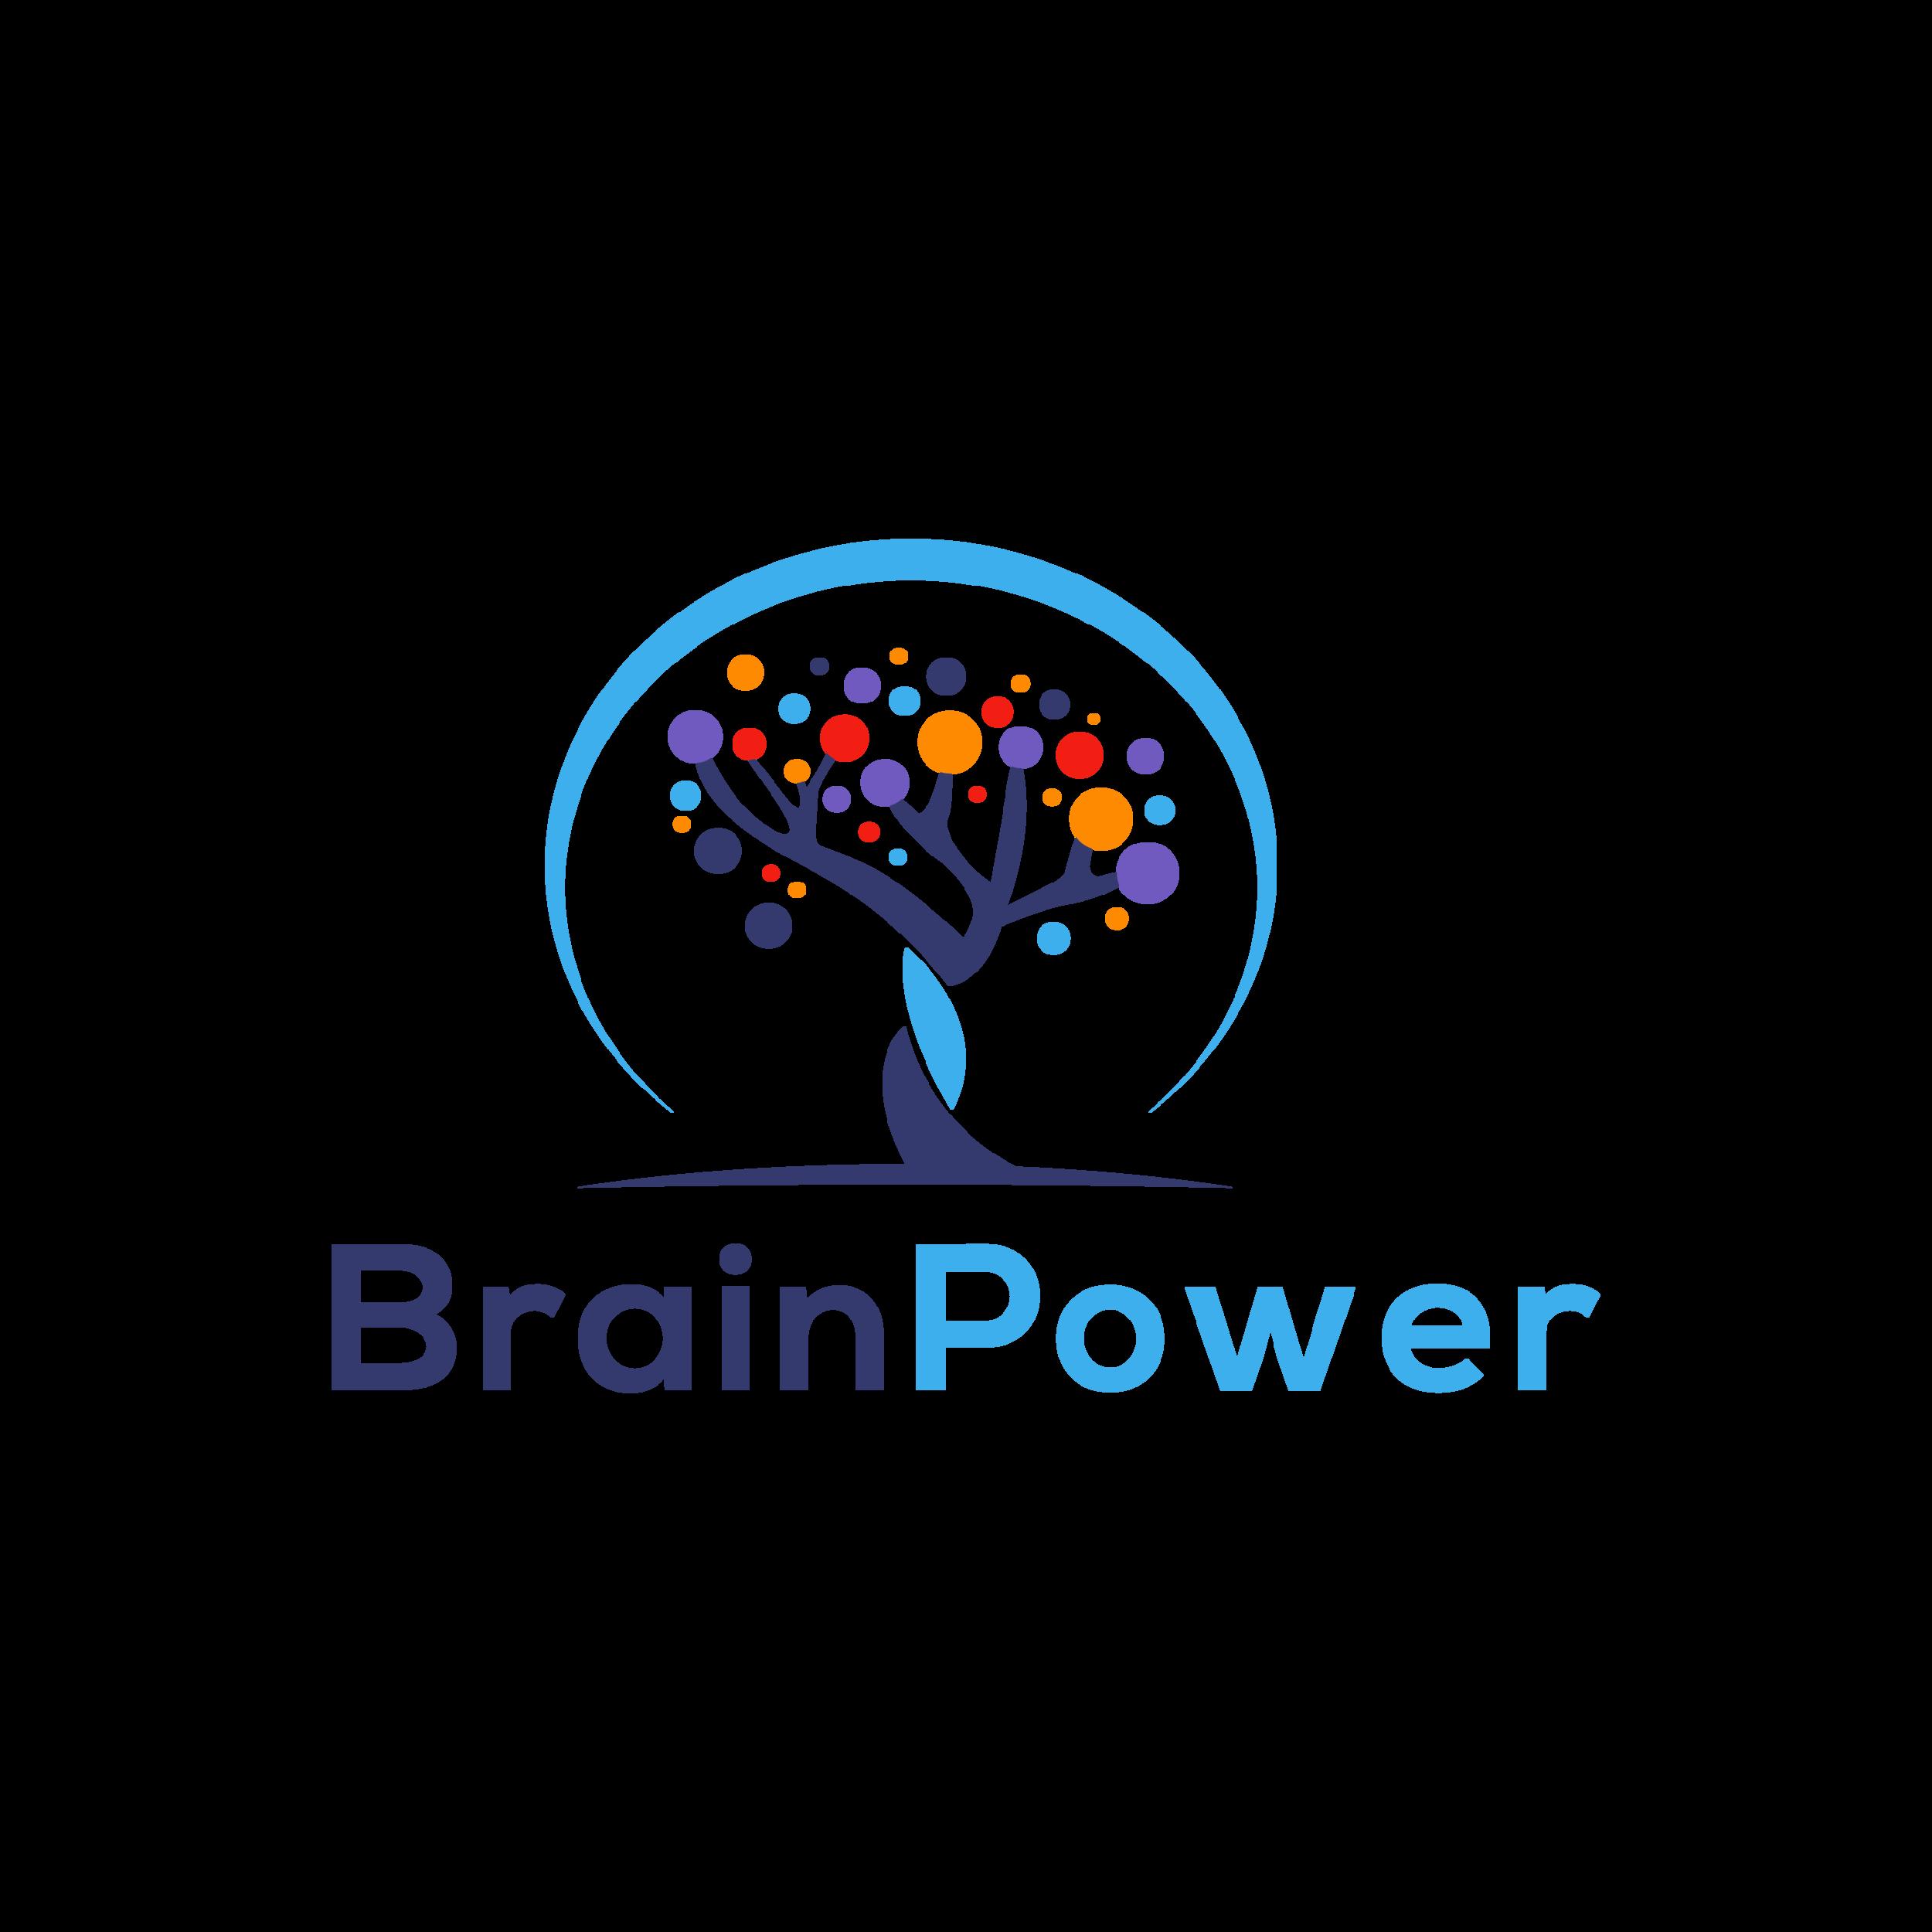 BrainPower-final logo-pngversion.png